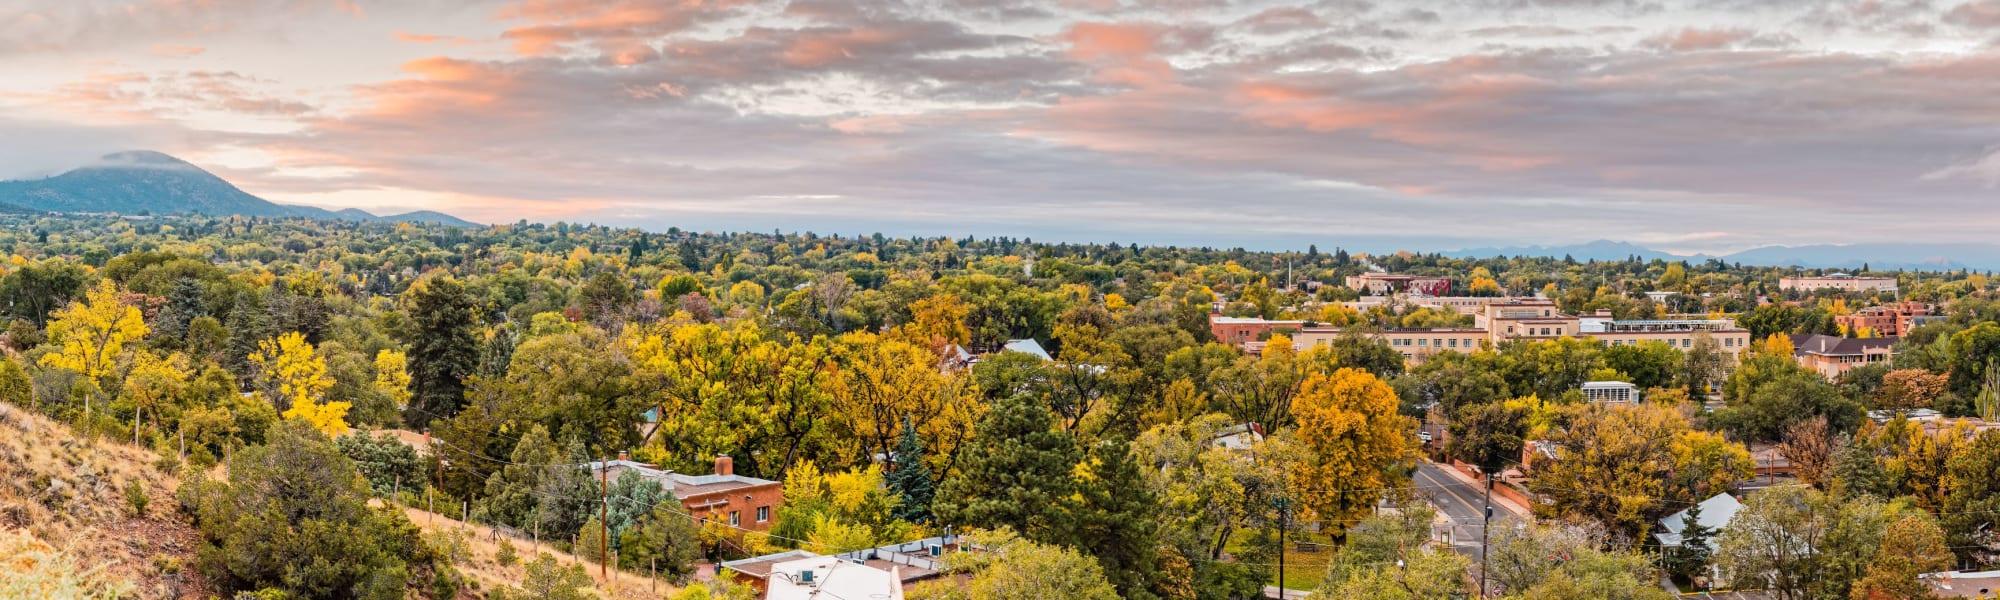 Neighborhood of Capitol Flats in Santa Fe, New Mexico